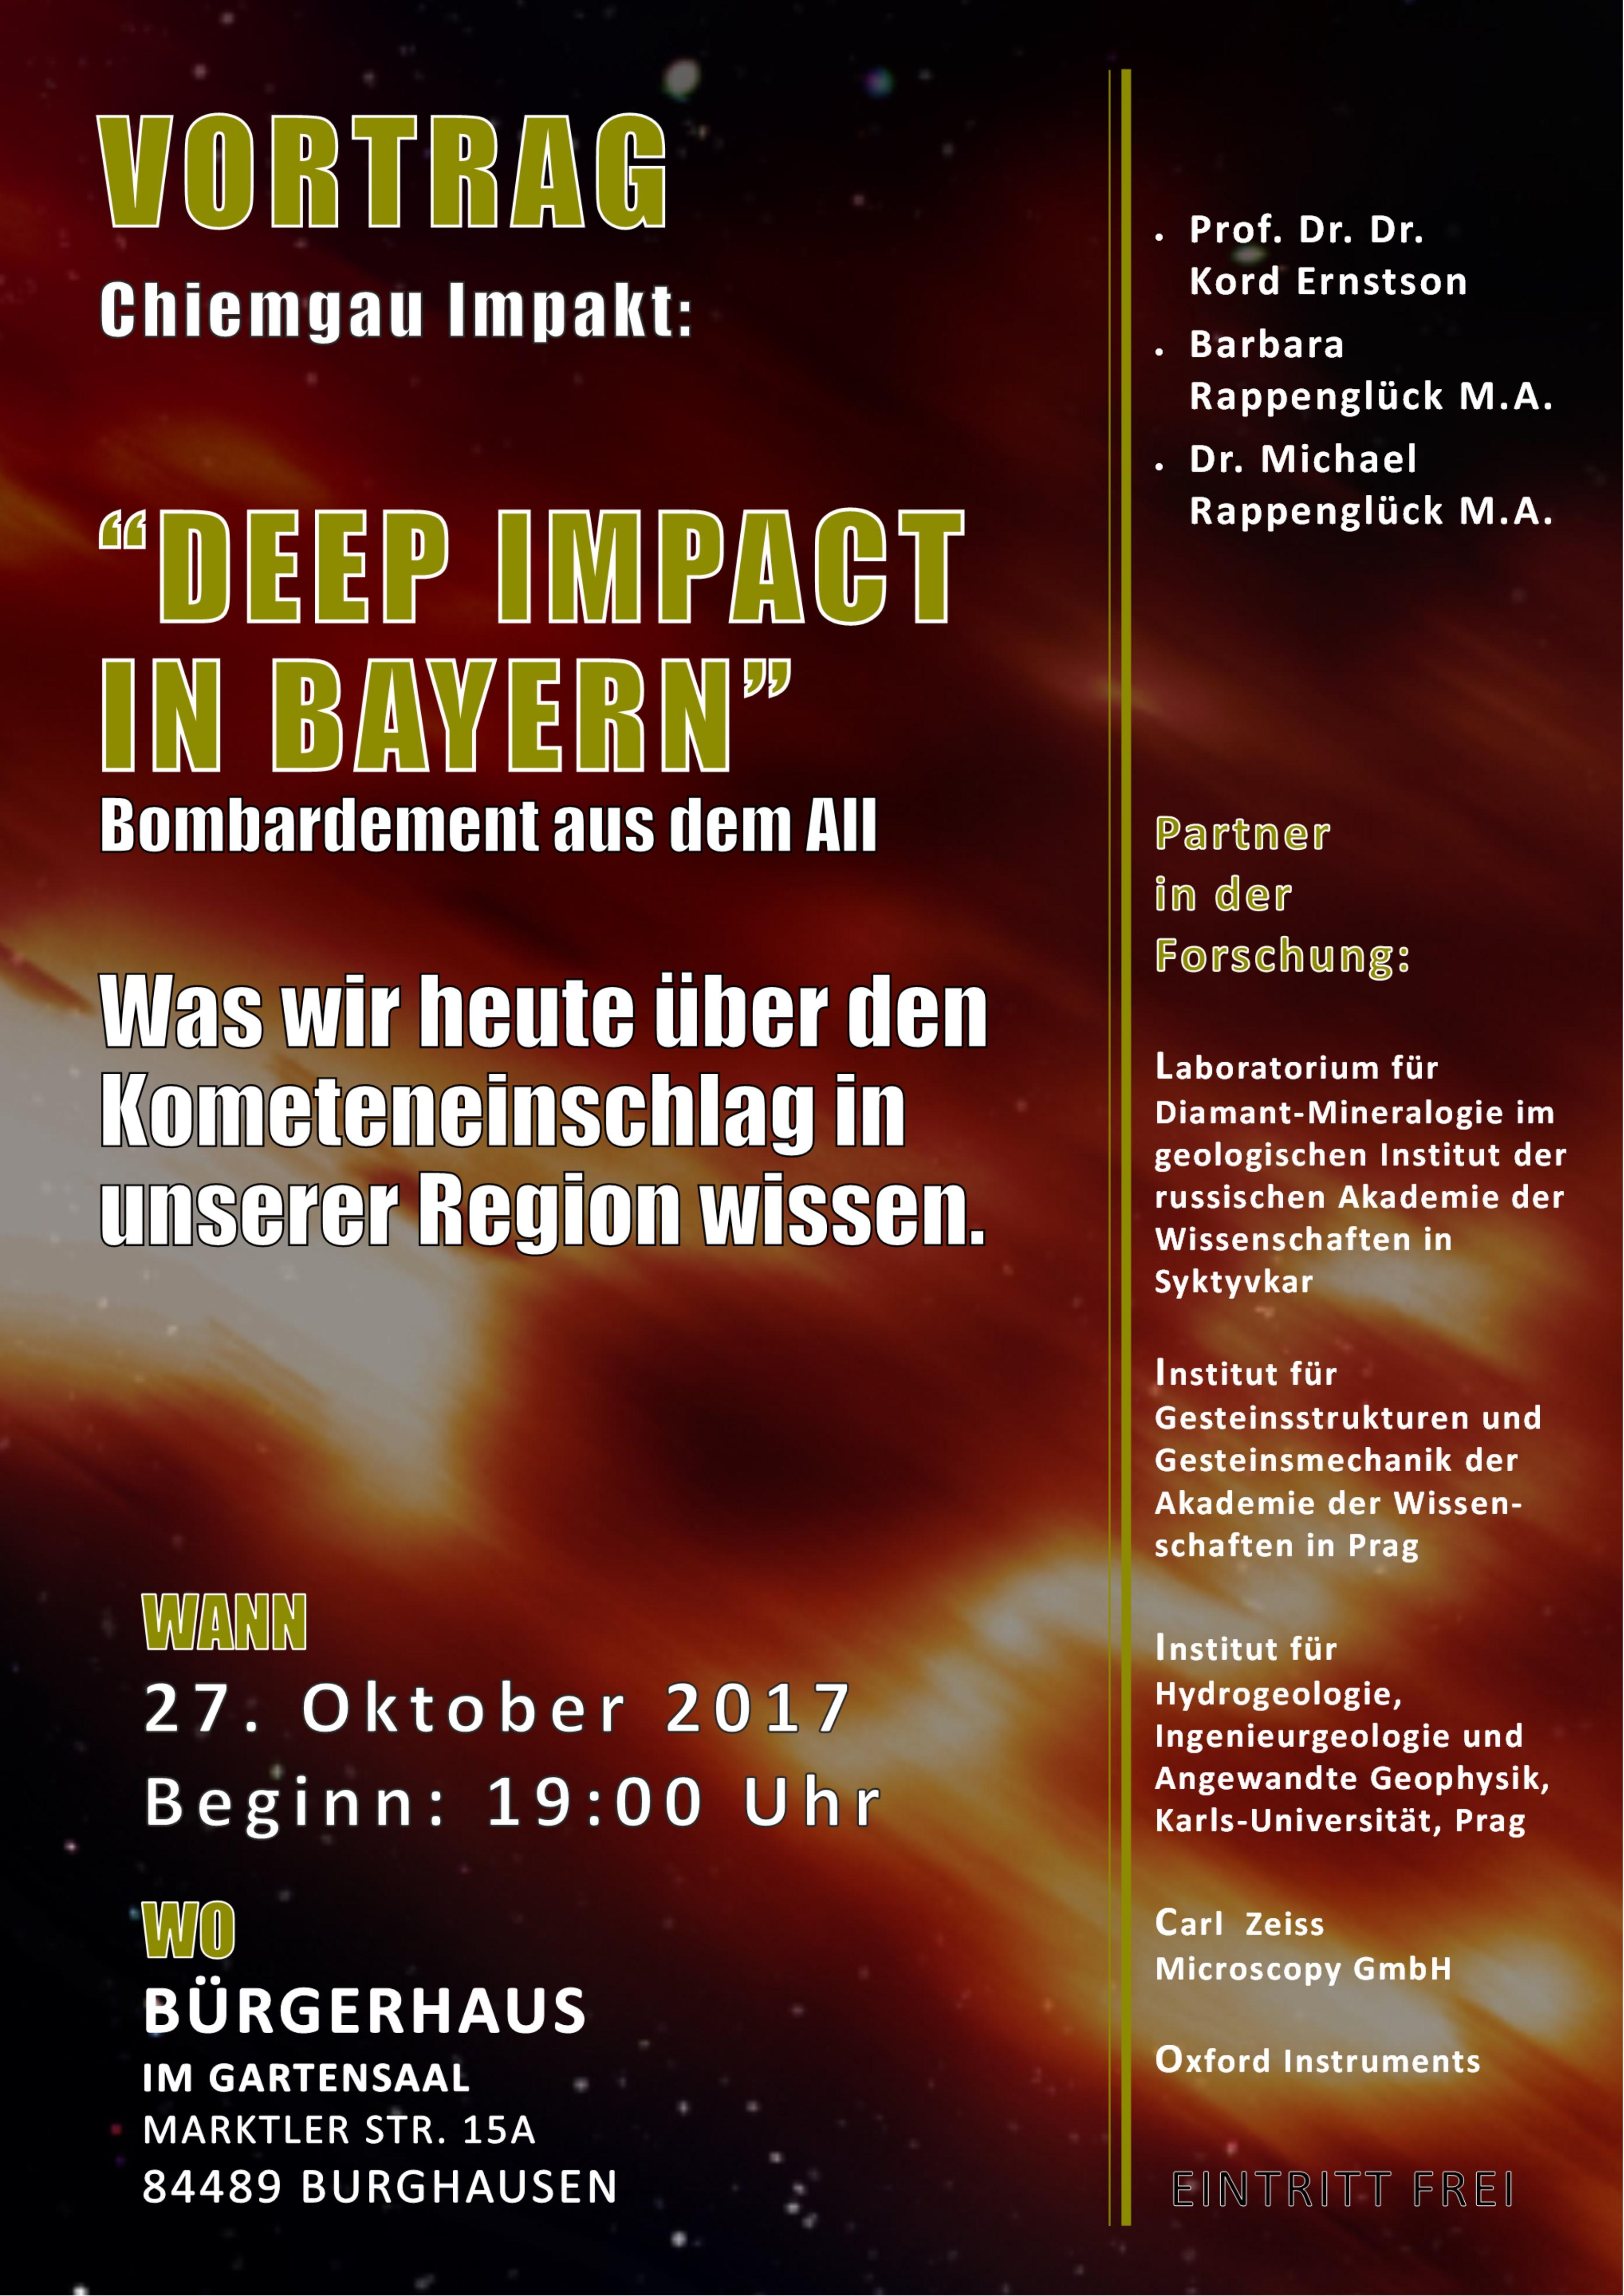 deep impact Burghausen Vortrag Chiemgau Impakt